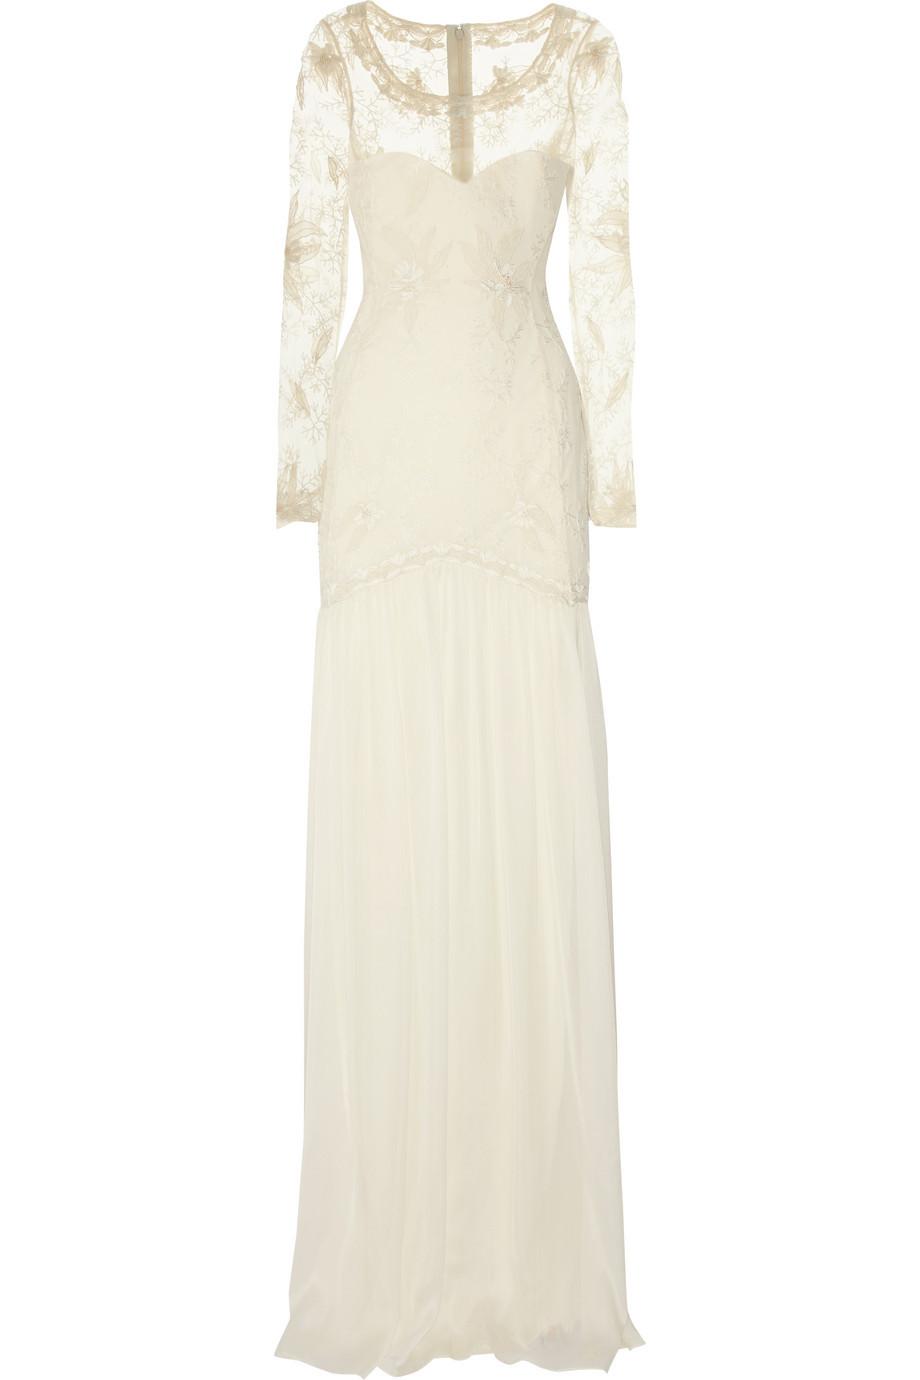 Temperley-london-wedding-dress-cream-with-sheer-sleeves.full